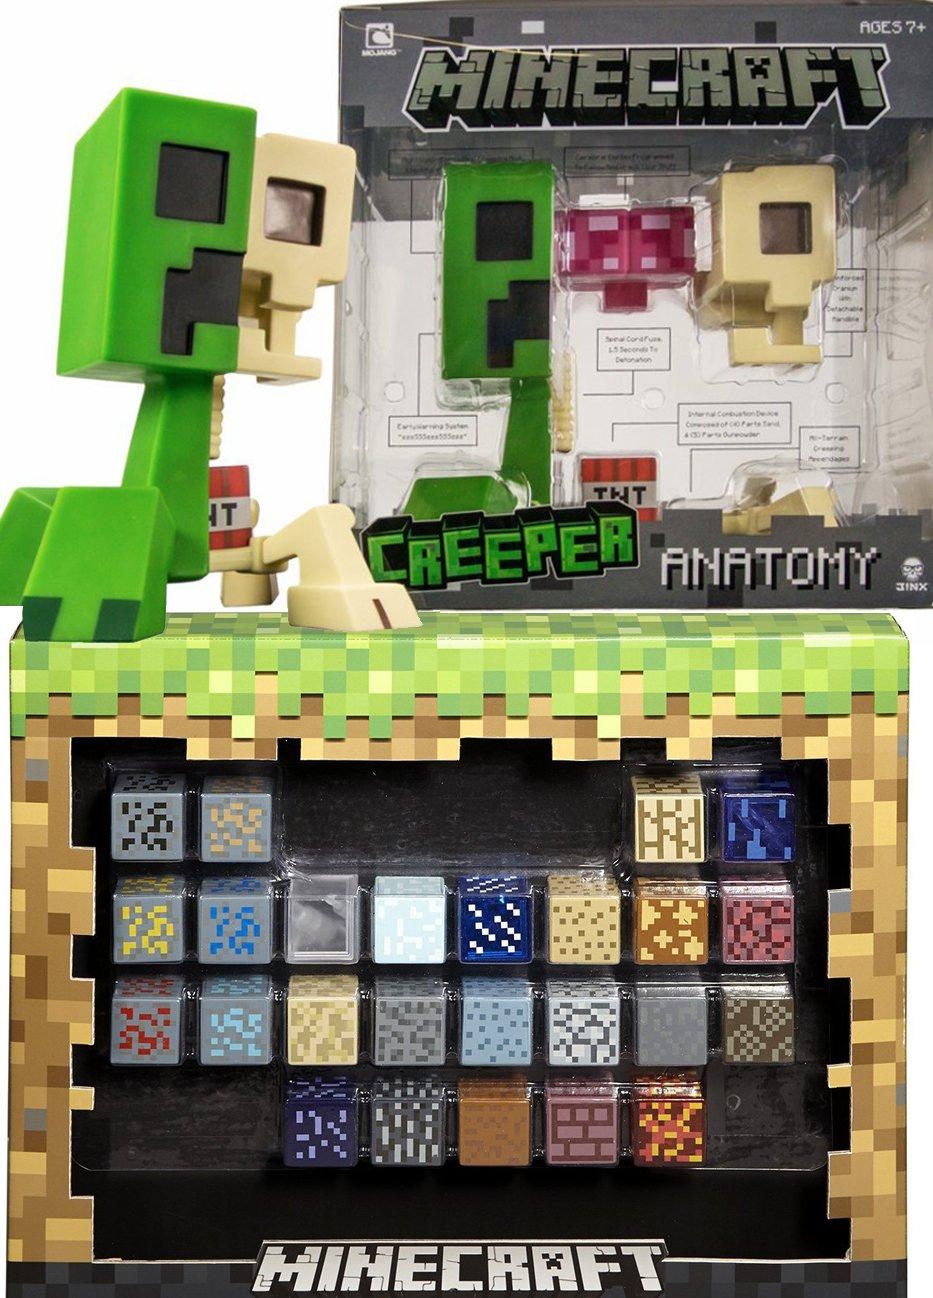 Amazon.com: Minecraft Elements with Giant Sized Creeper Figure ...